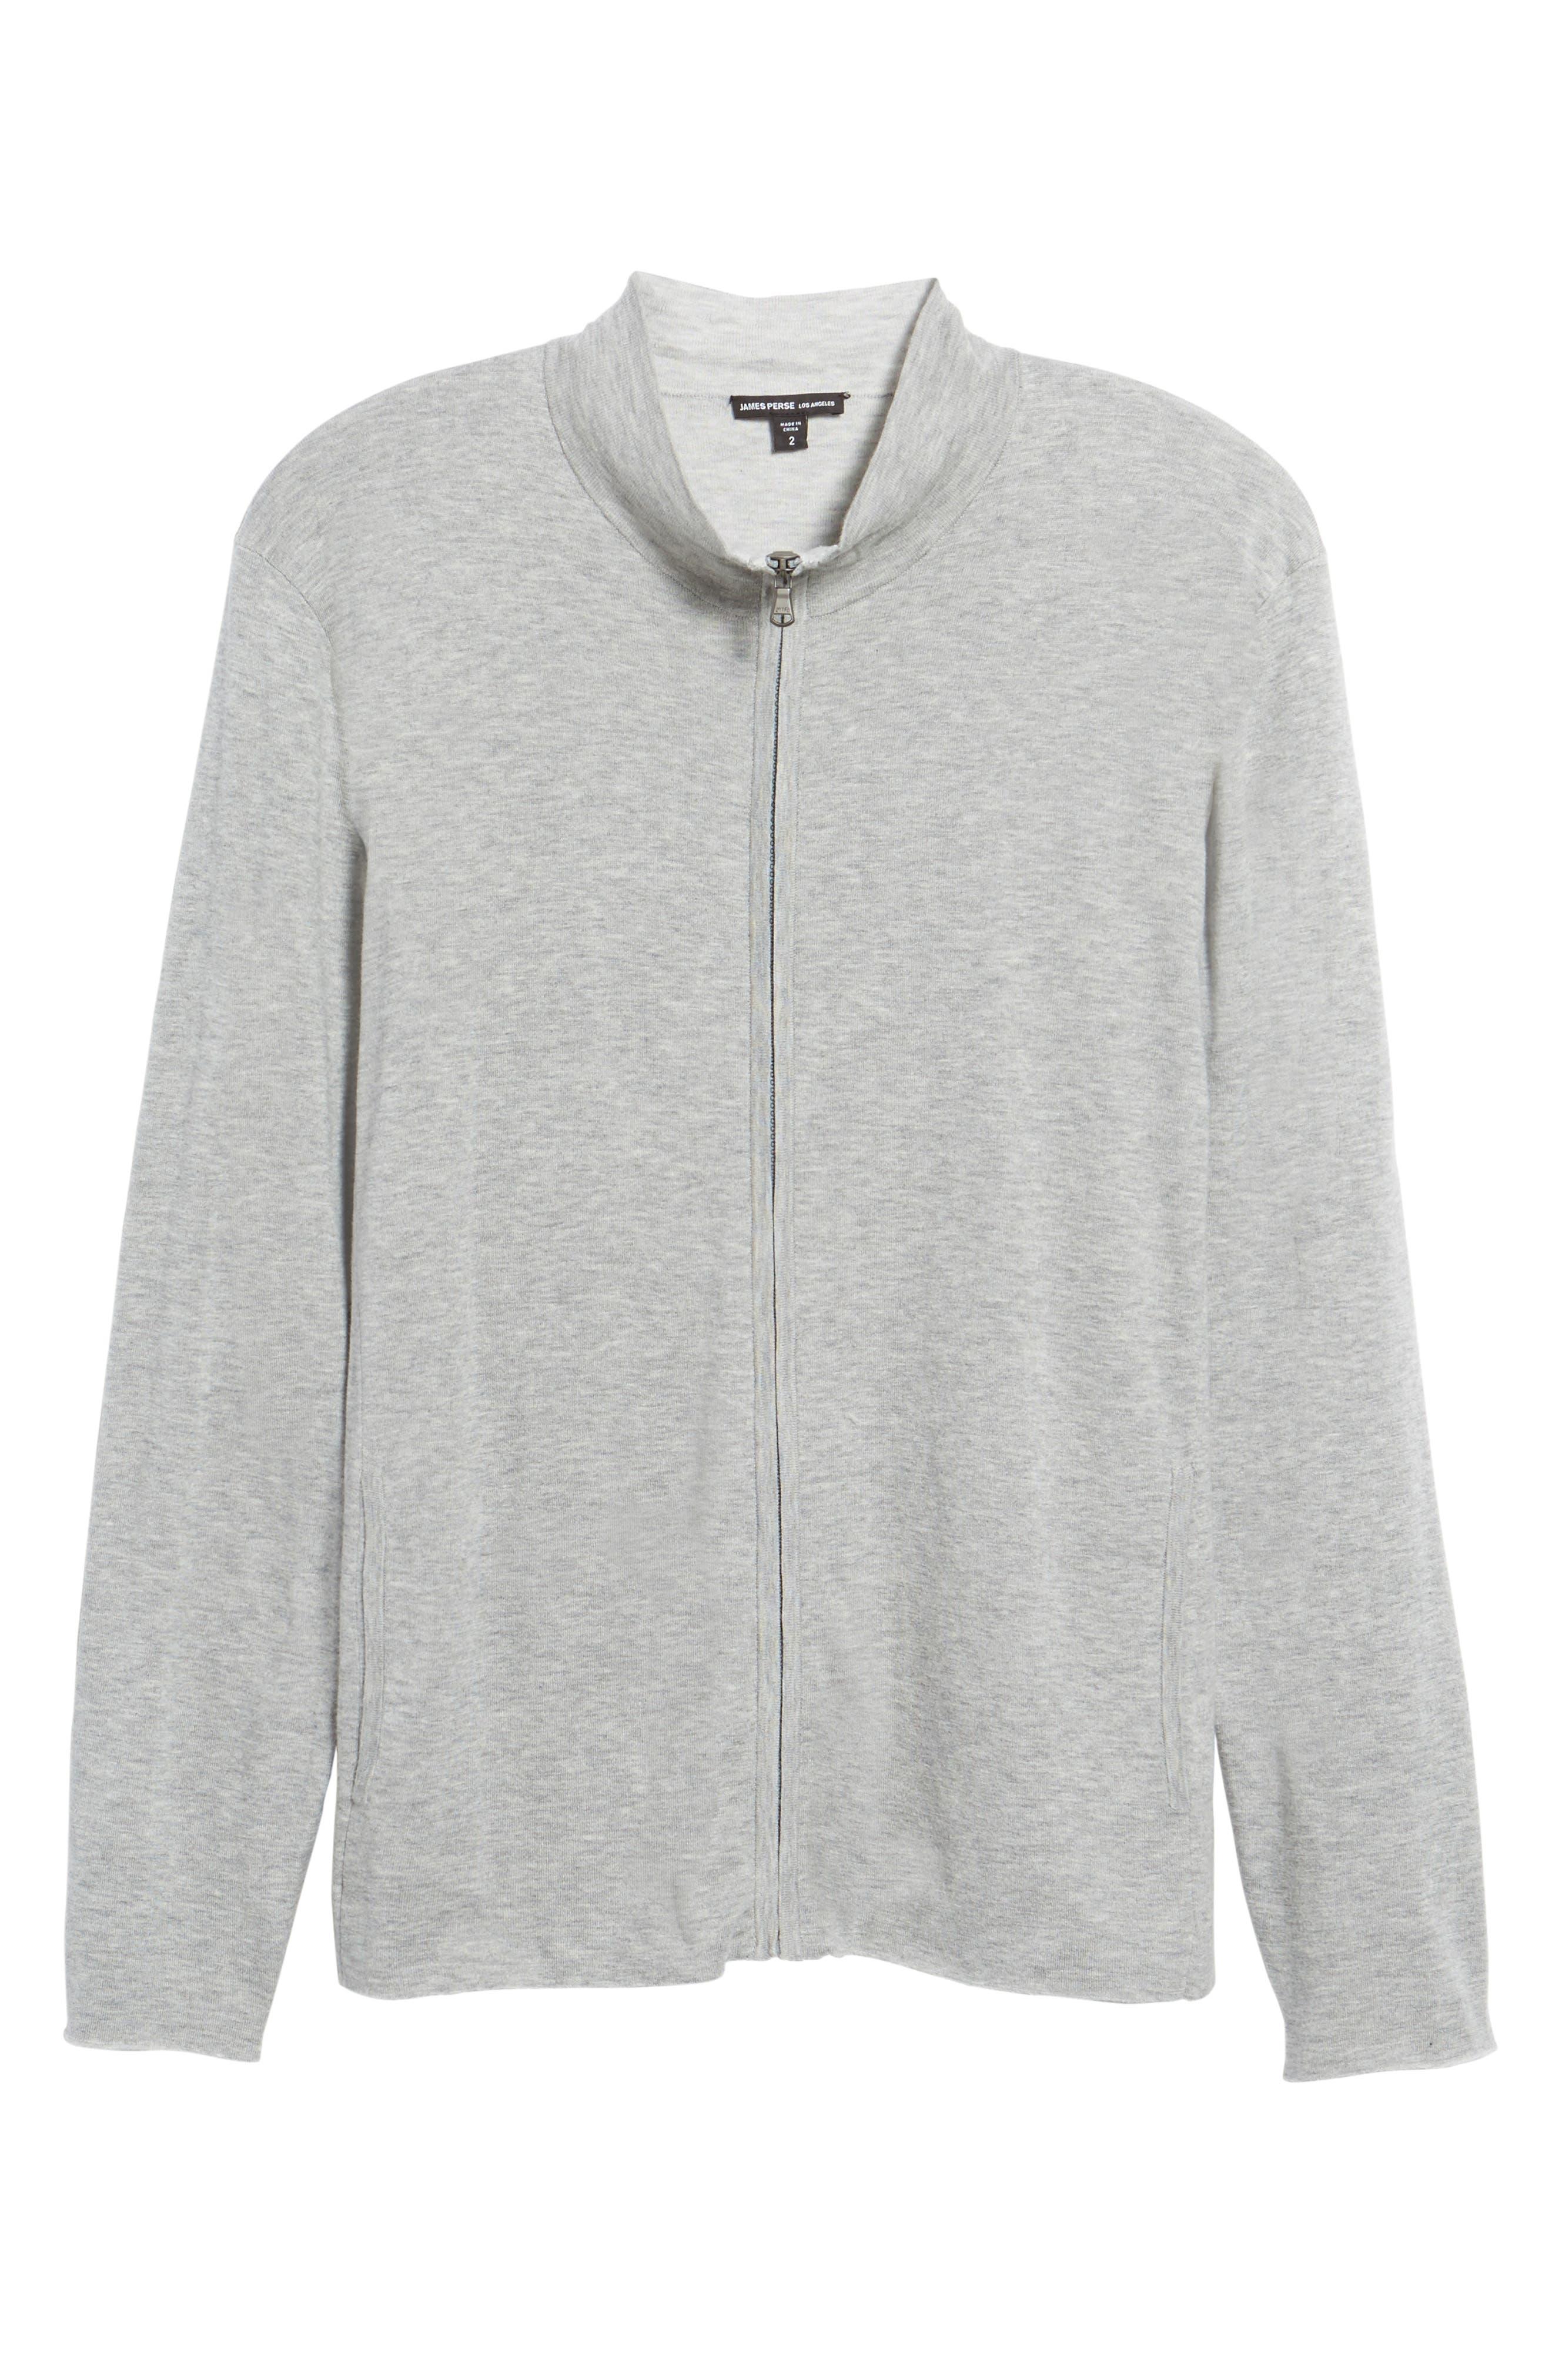 Mock Neck Zip Sweatshirt,                             Alternate thumbnail 6, color,                             Heather Grey/ Platinum